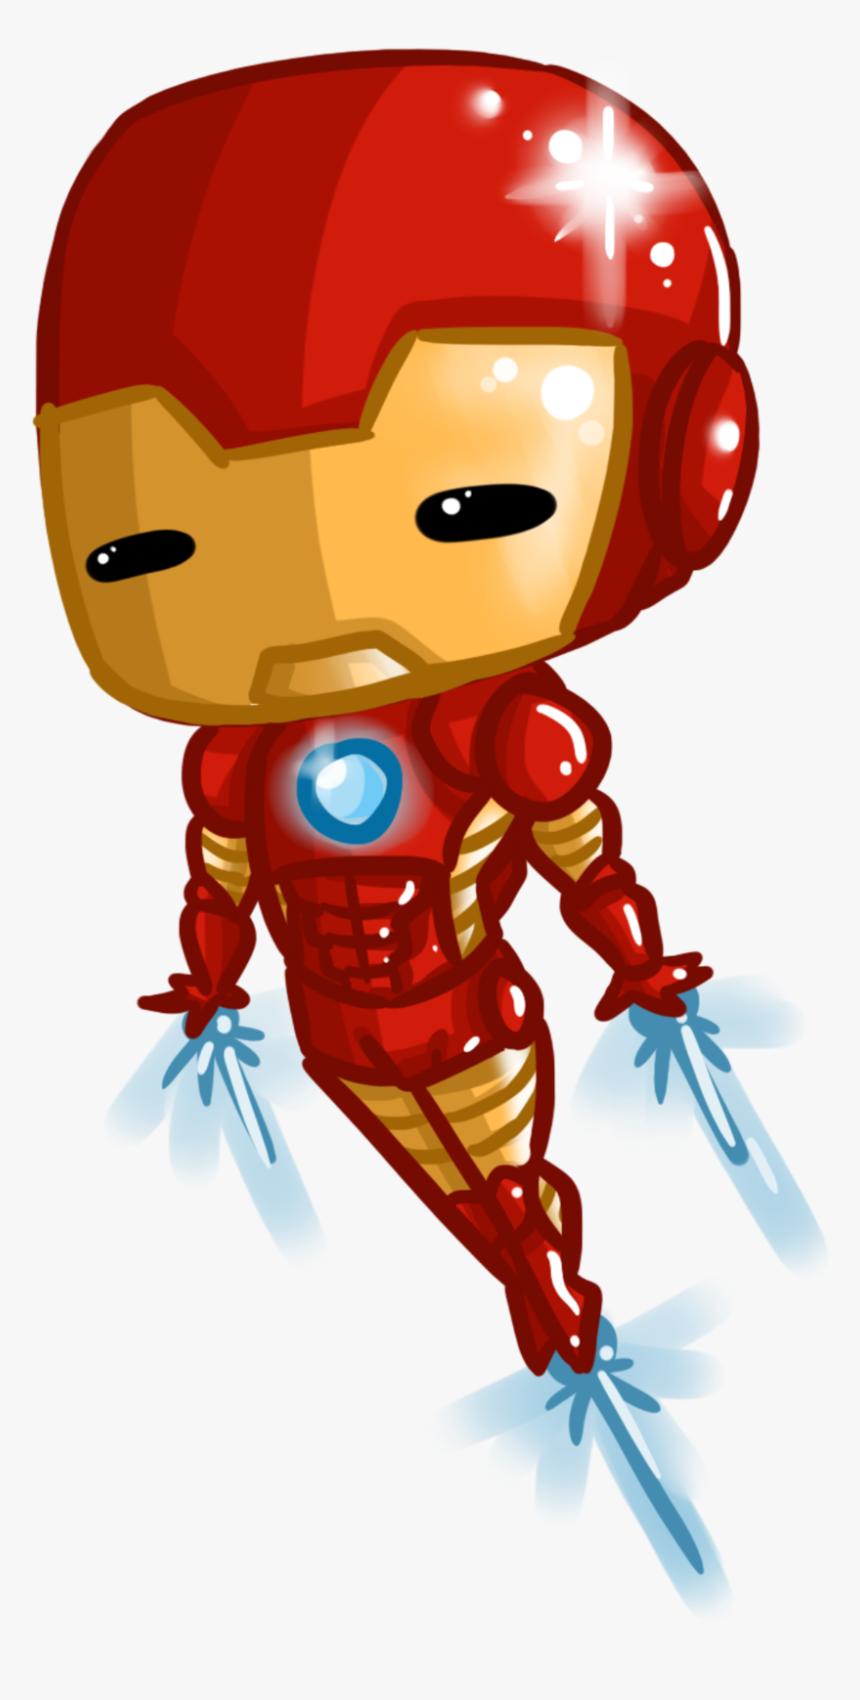 Transparent Man Clipart - Iron Man Chibi Drawing, HD Png Download, Free Download